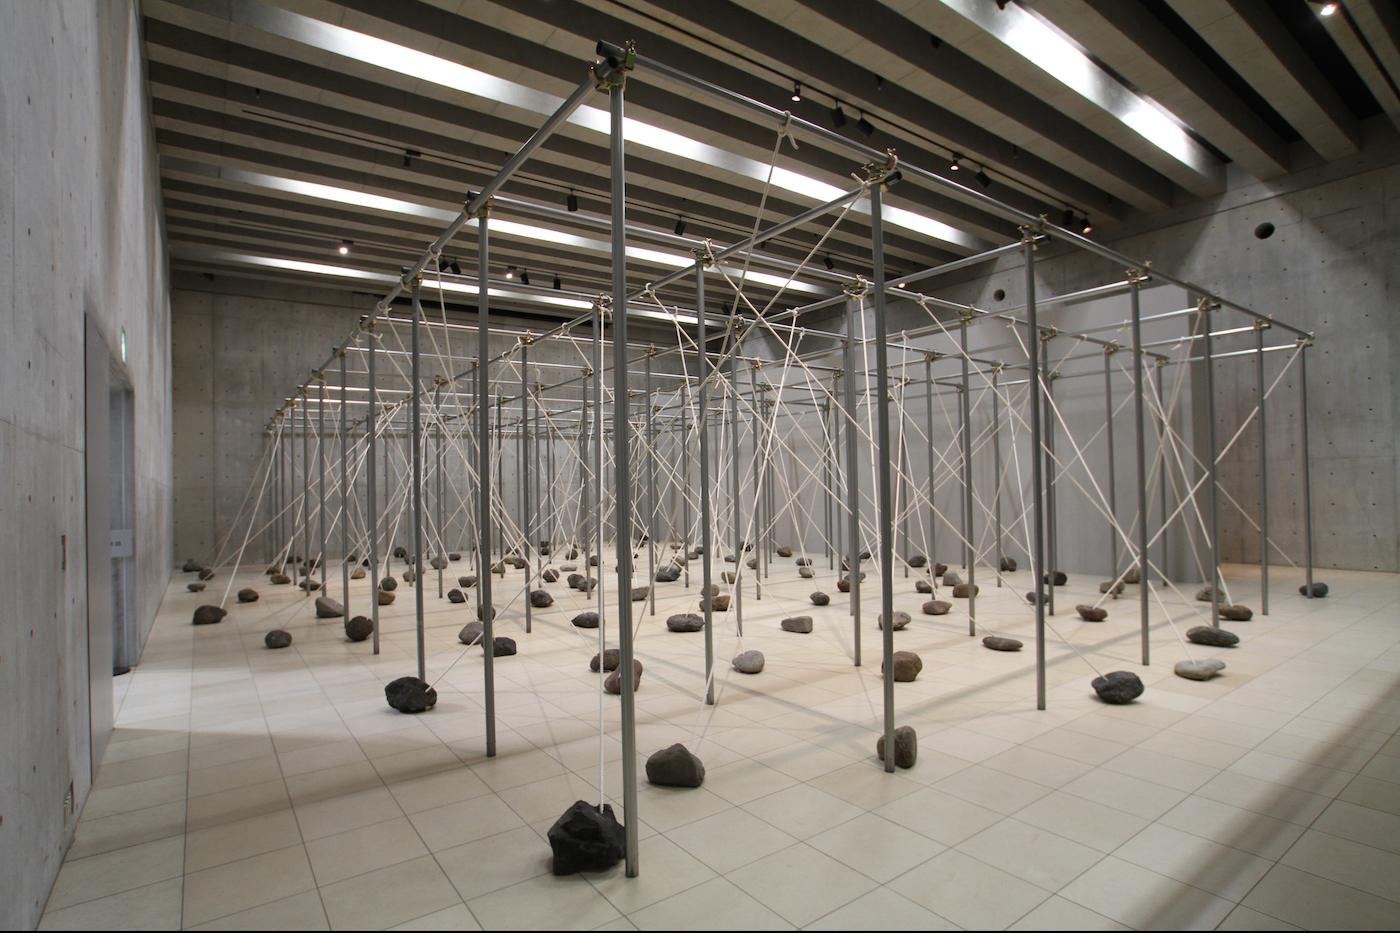 Law of Peripheral Units , 1997/2014 周位律 ( Shūiritsu ) Steel pipes, stone, rope Dimensions variable Installation view,  Kishio Suga ,Vangi Sculpture Garden Museum, Shizuoka, 2014 Photo: Tsuyoshi Satoh